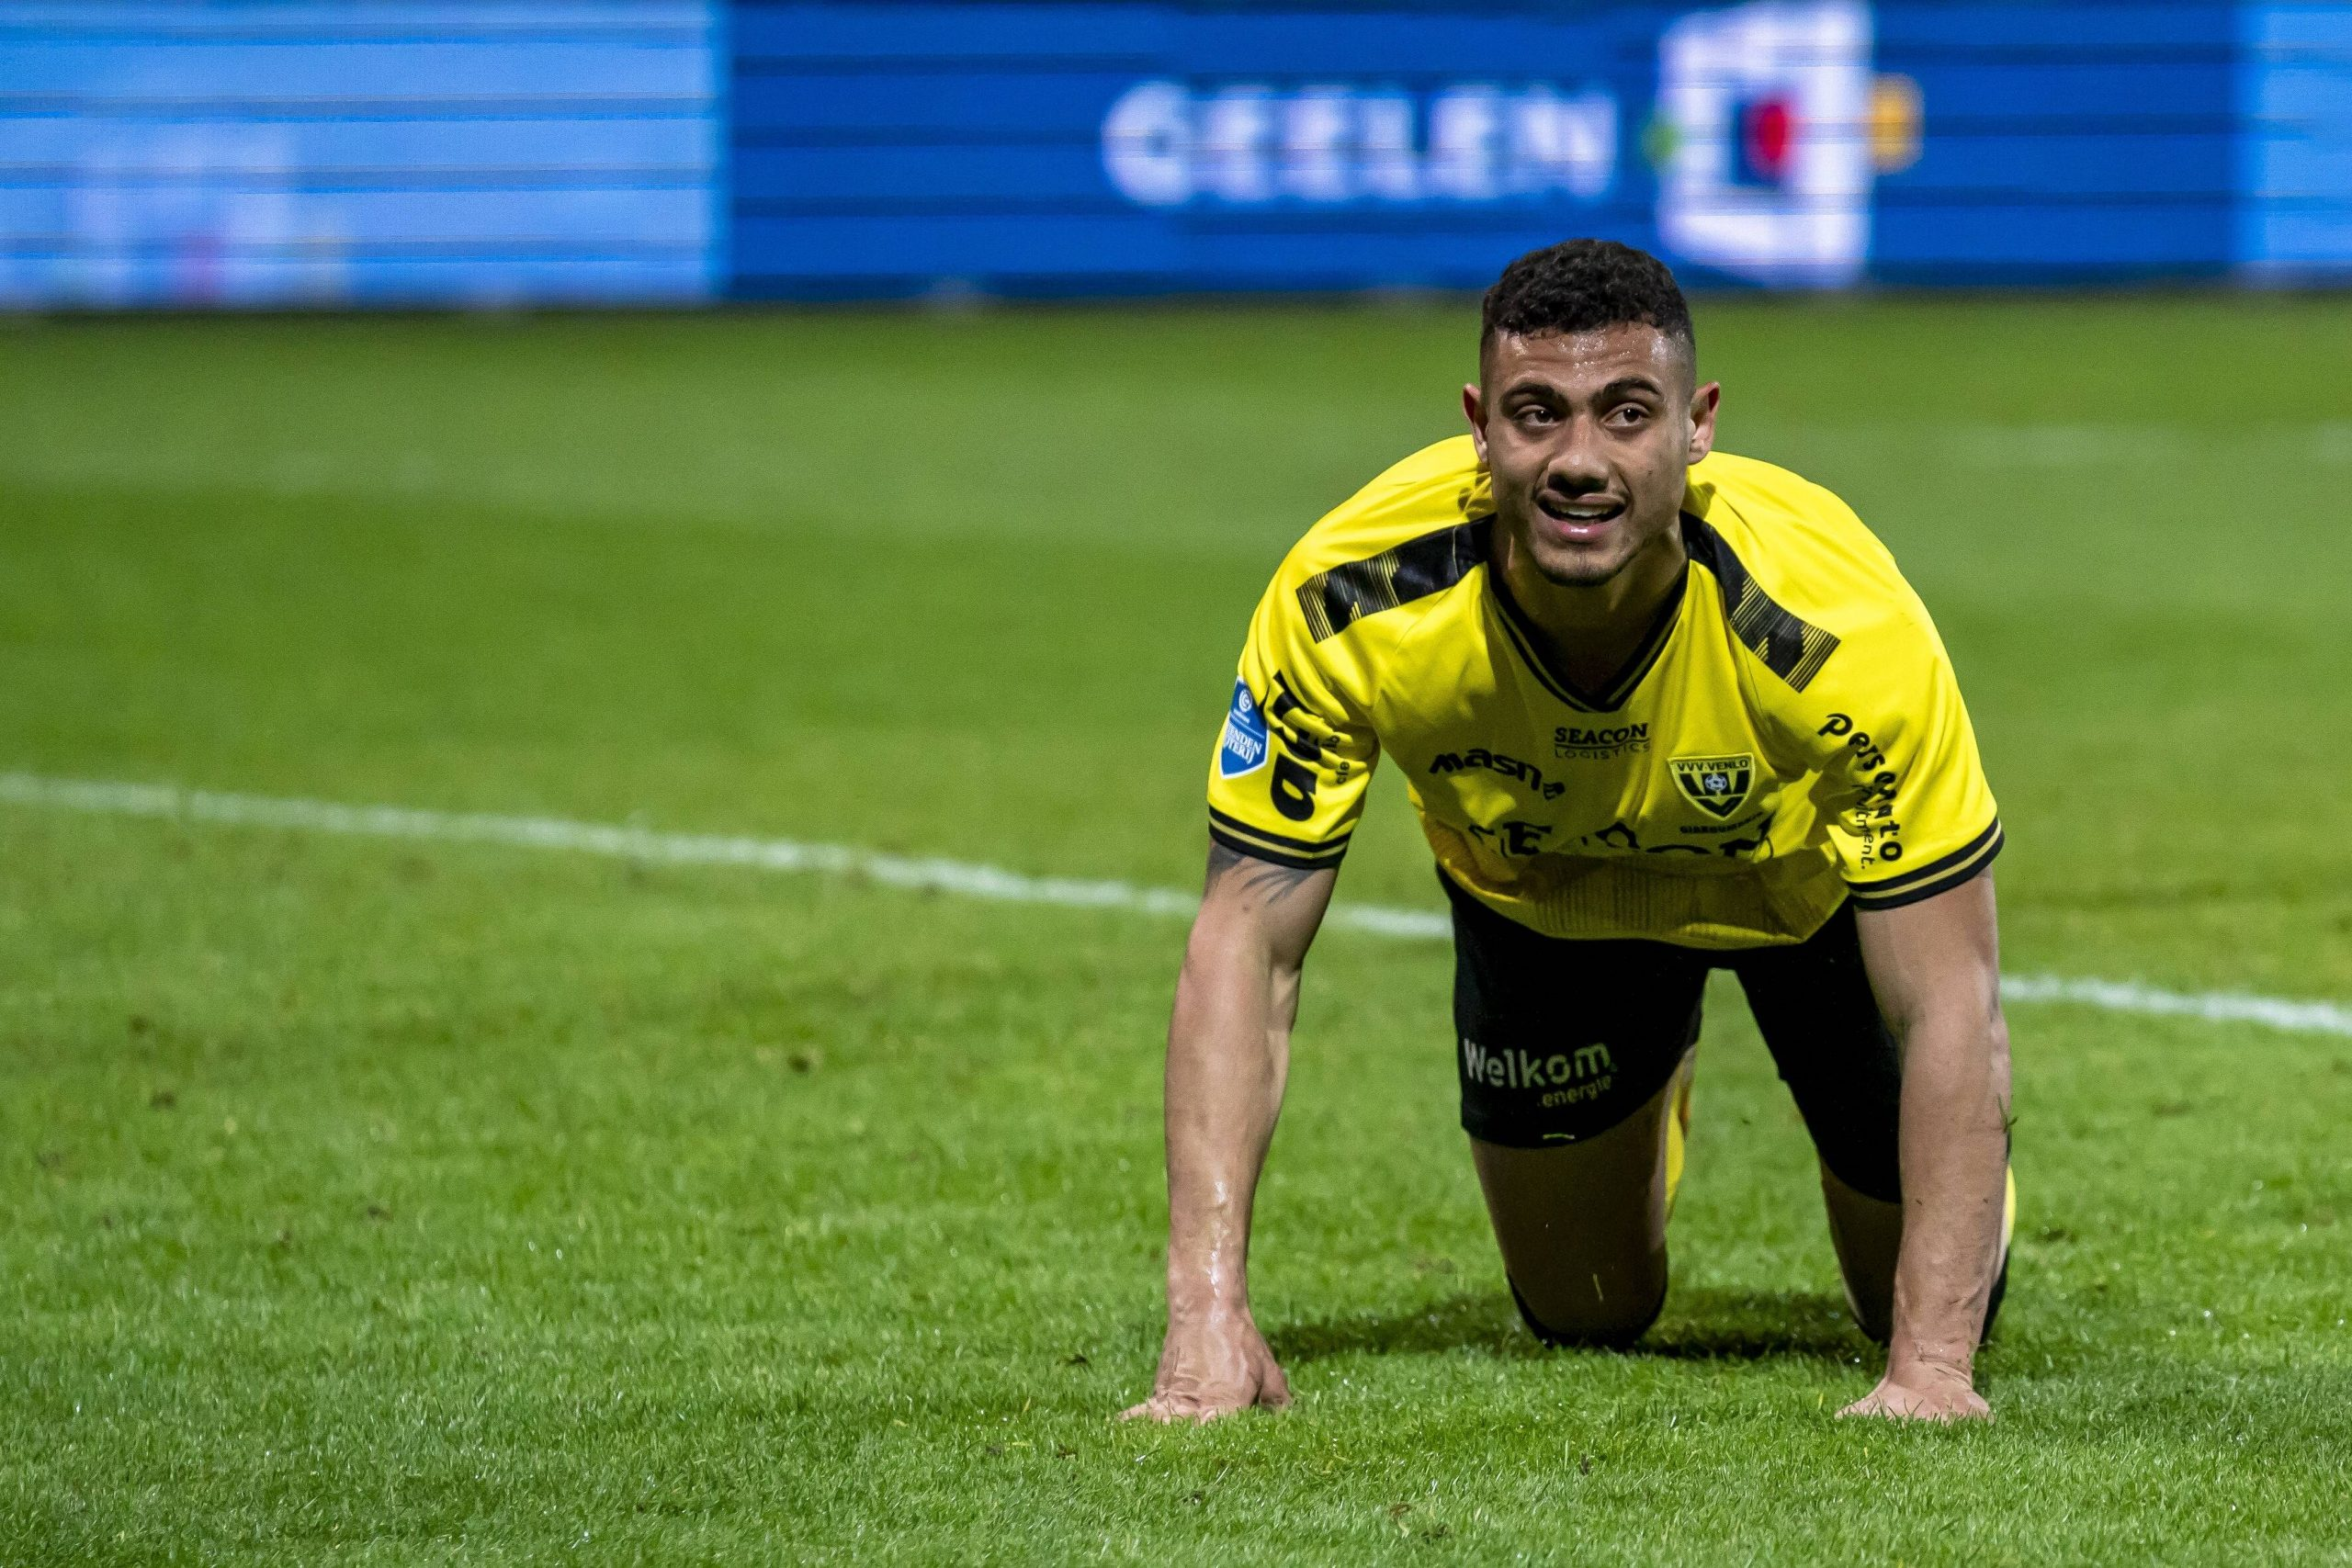 VENLO, Netherlands, 08-05-2021, football, , Dutch eredivisie, season 2020 / 2021, VVV Venlo player Georgios Giakoumakis during the match VVV – RKC VVV – RKC PUBLICATIONxNOTxINxNED x11718818x Copyright: